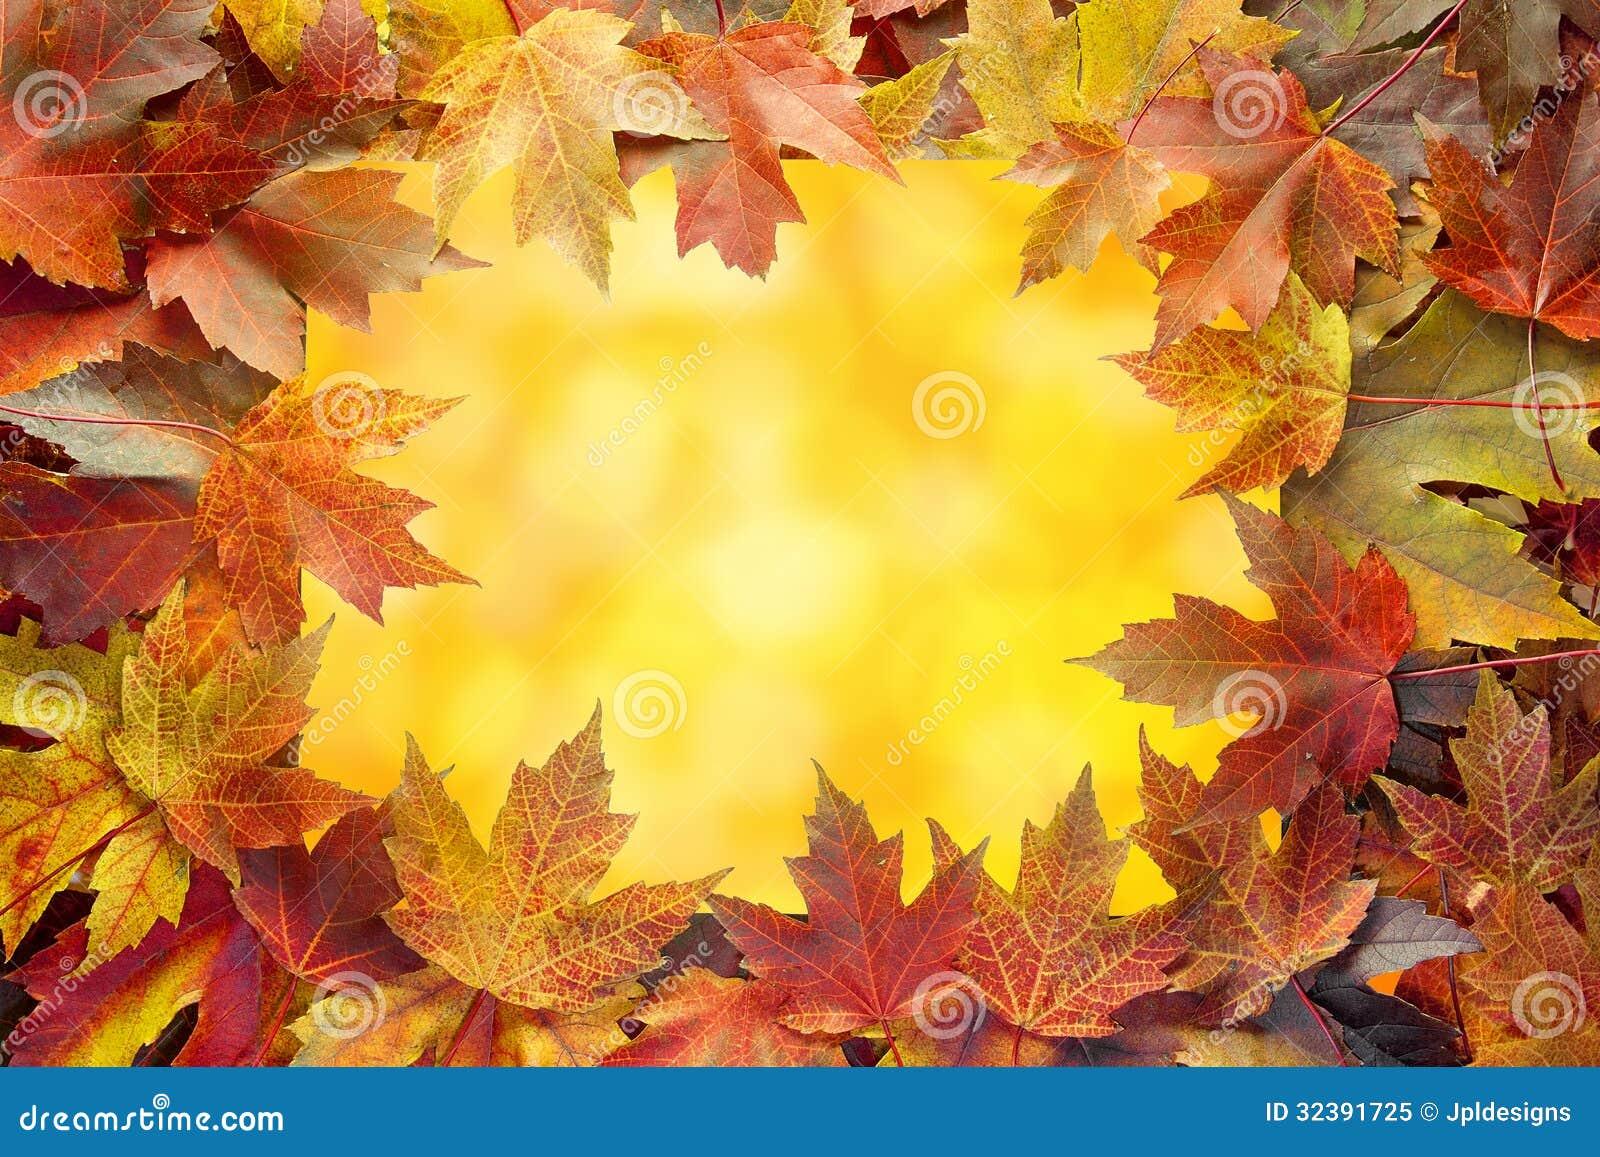 autumn fall tree backgrounds - photo #43